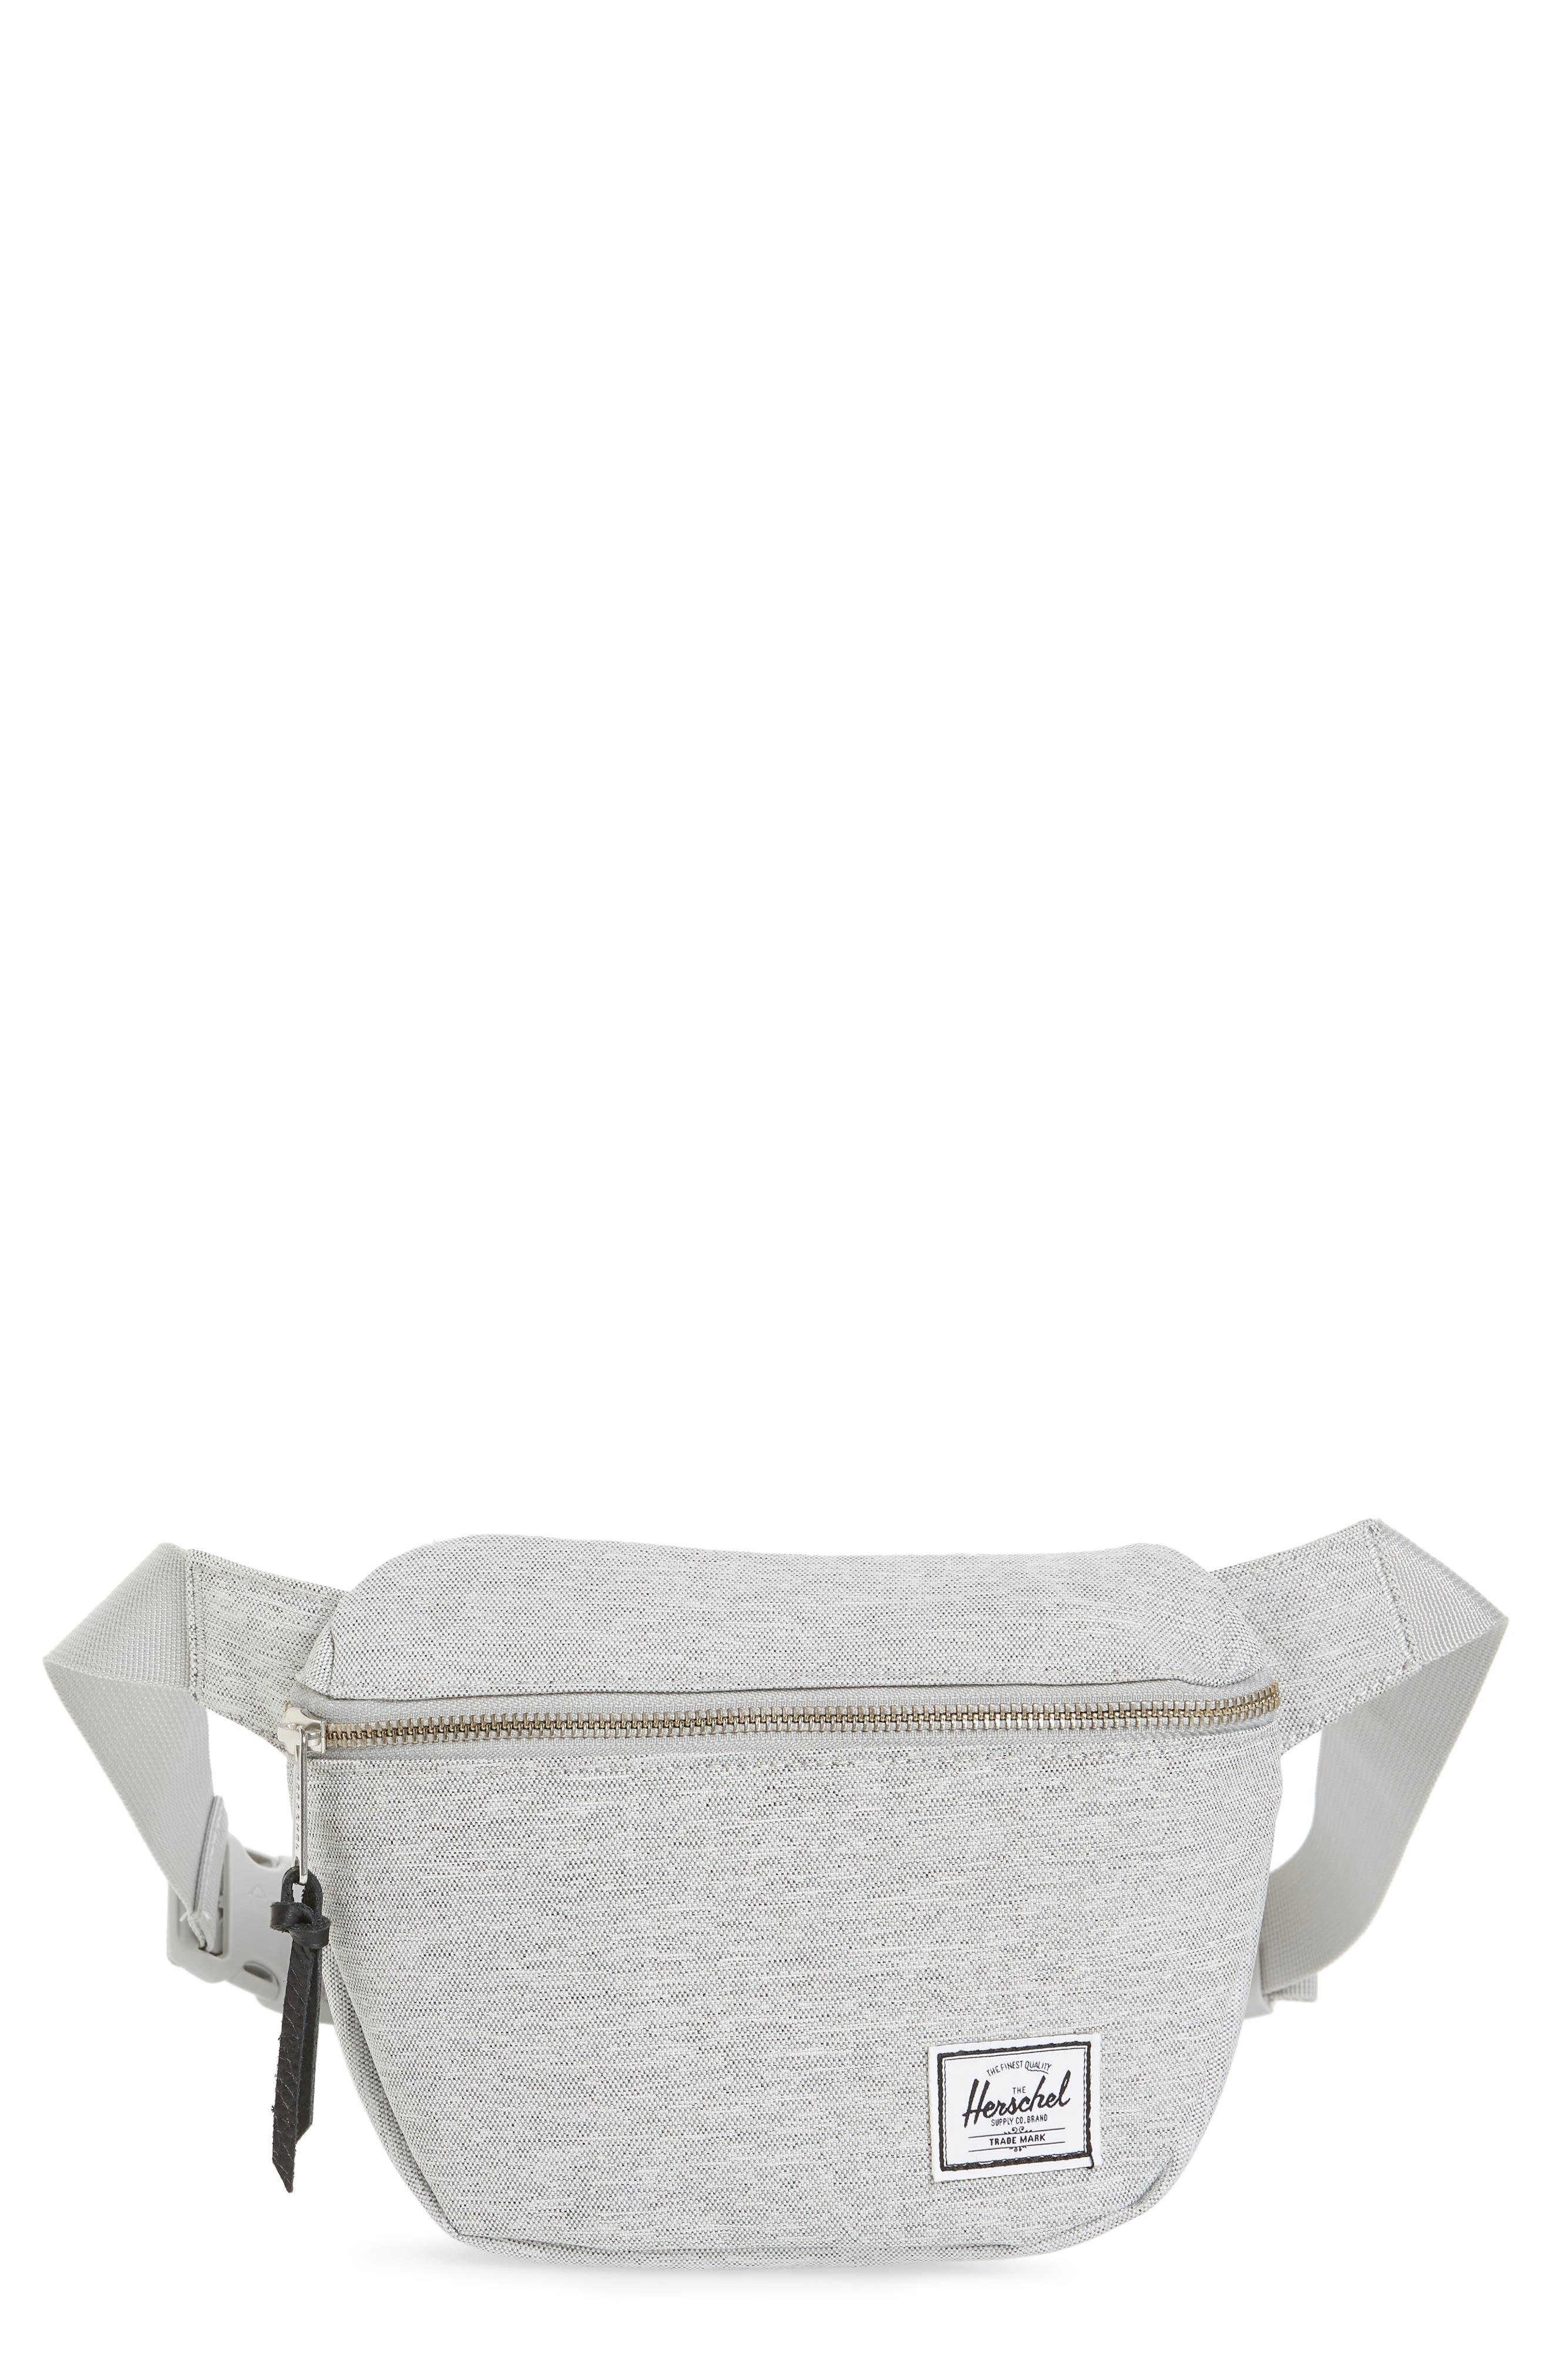 Fifteen Belt Bag,                         Main,                         color, Light Grey